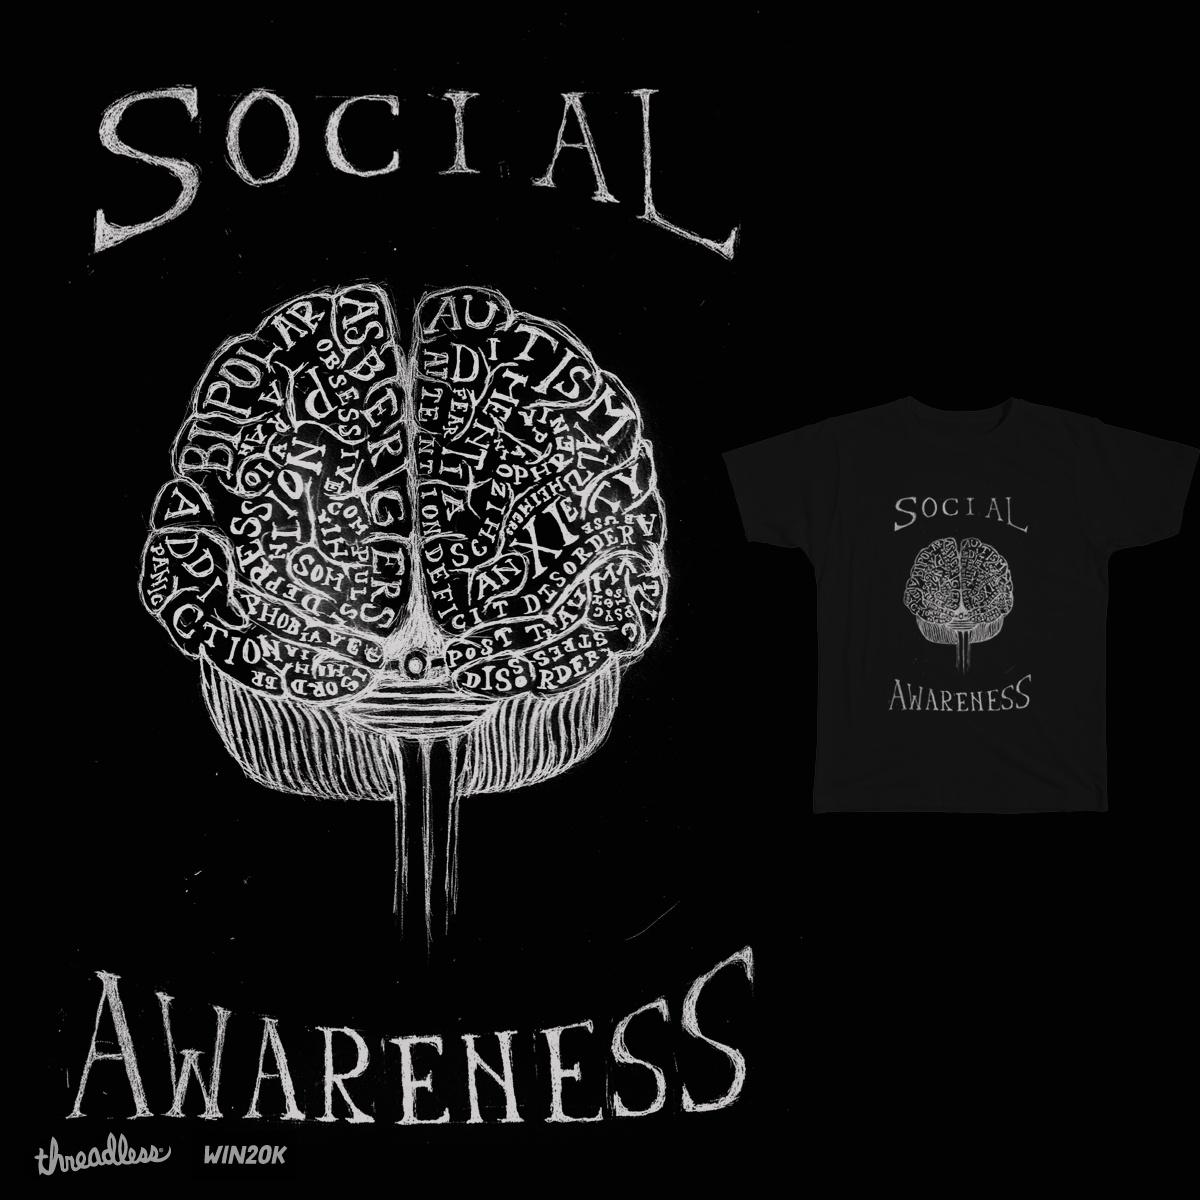 Social Awareness by TRYBYK on Threadless